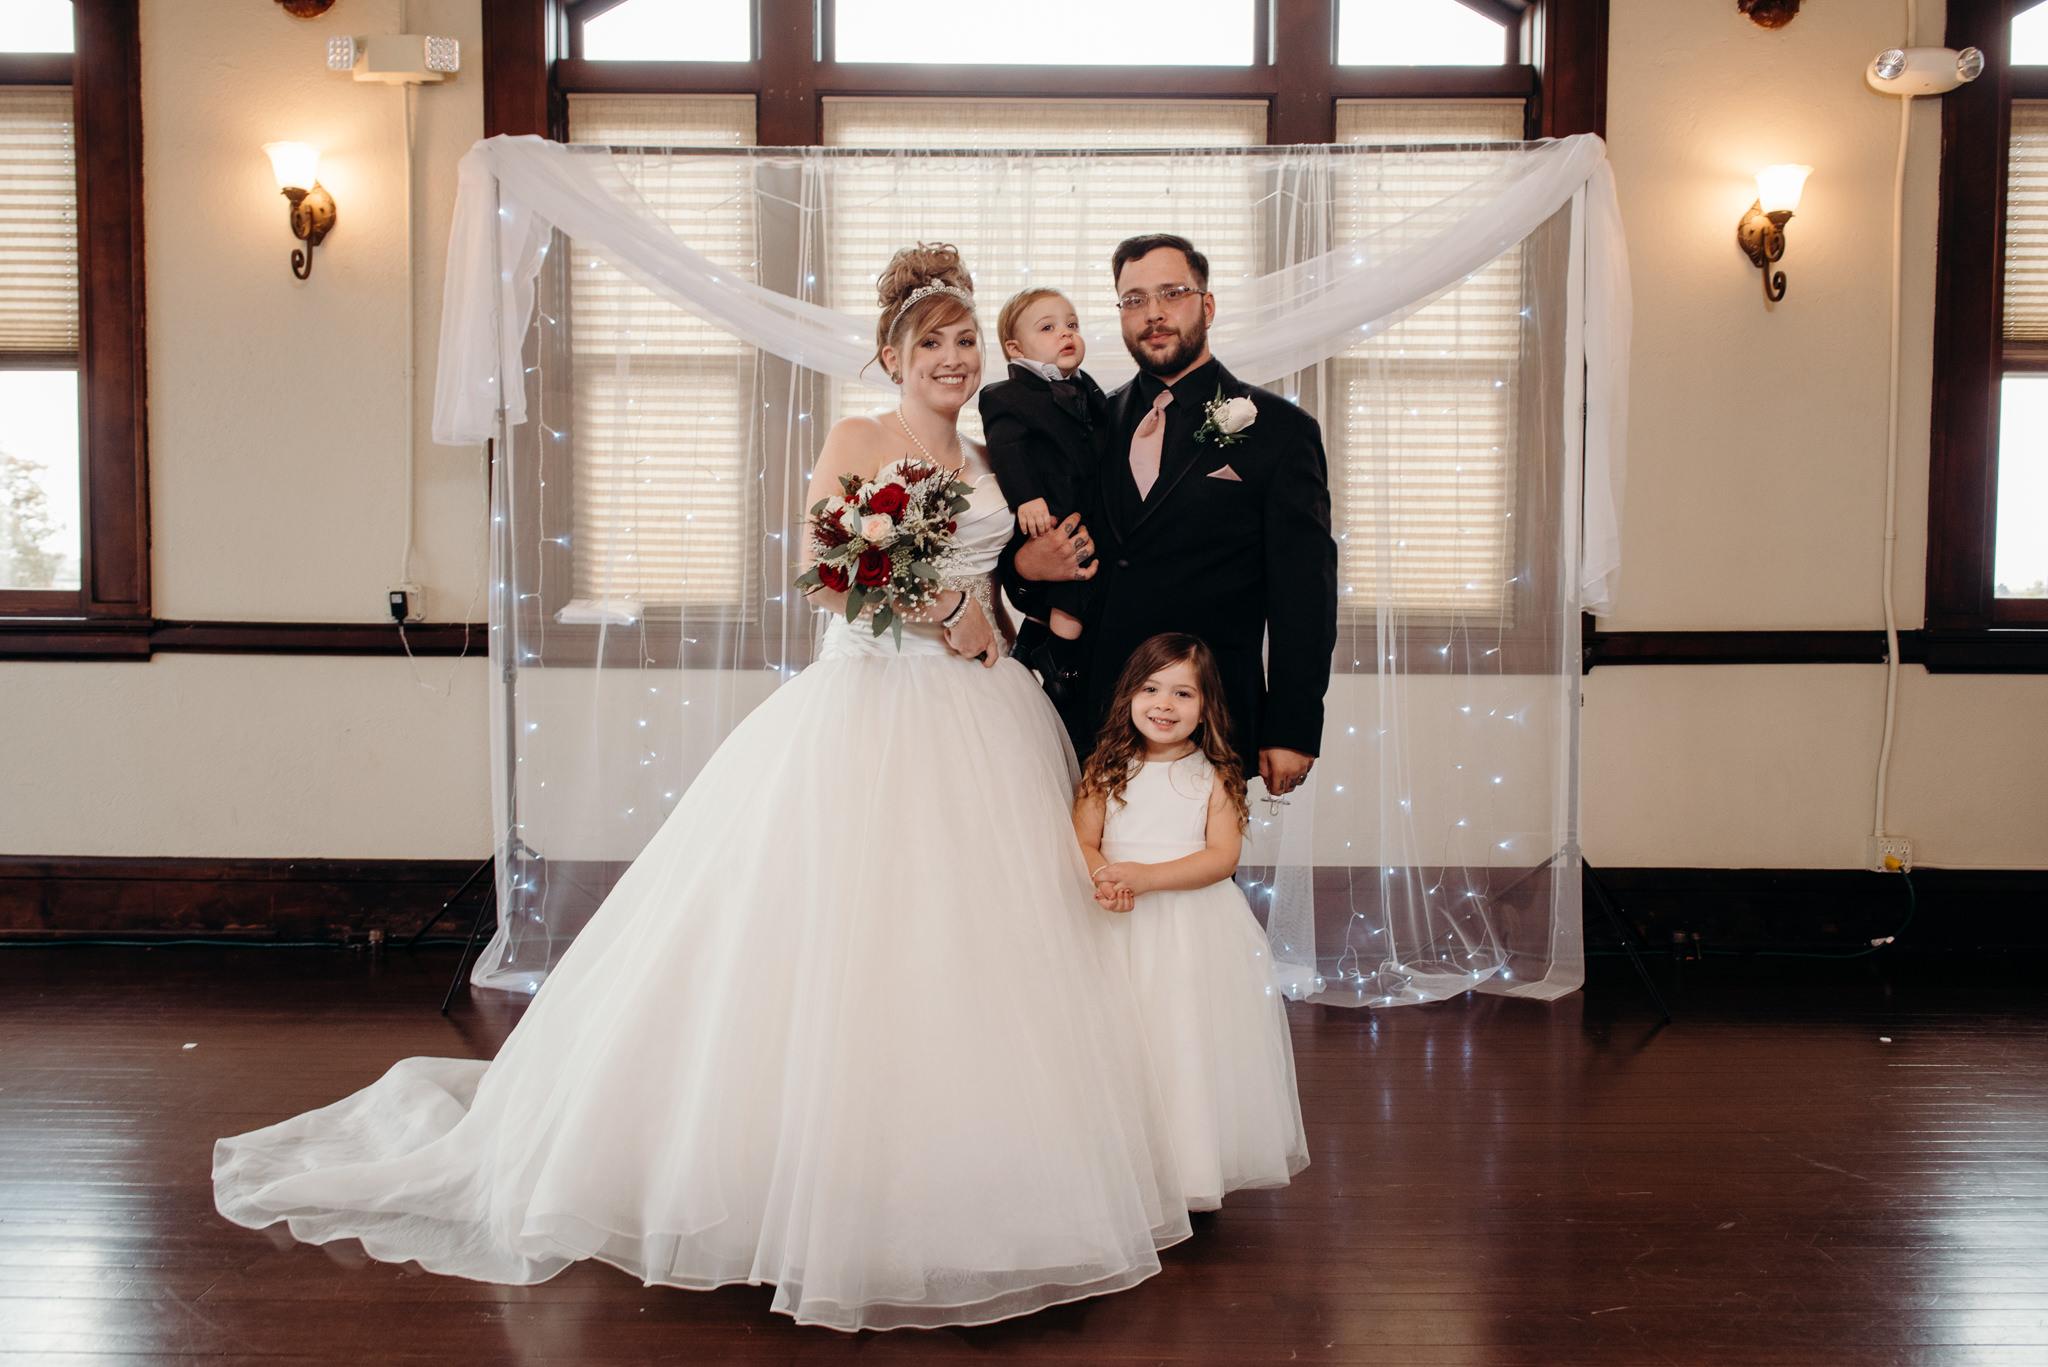 Grant Beachy Photo portrait wedding goshen elkhart south bend chicago-028.jpg